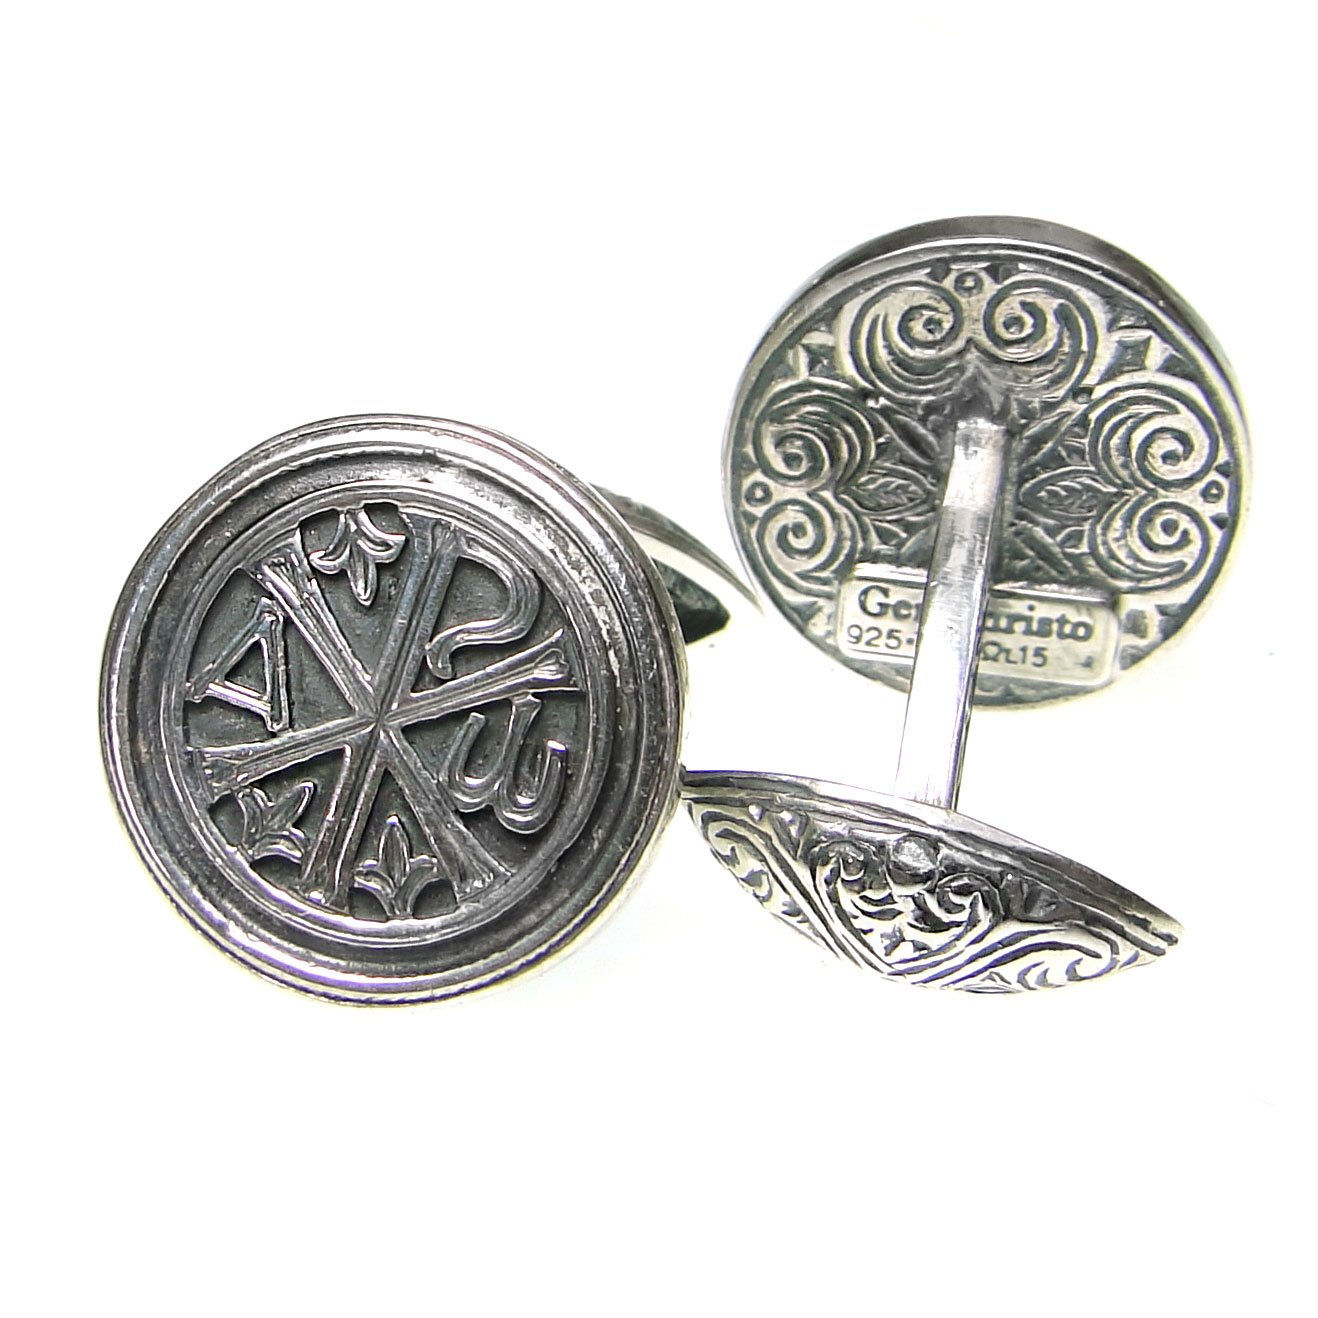 Gerochristo 7126 - Chi Rho-Chrismon - Silver Medieval Byzantine Cufflinks